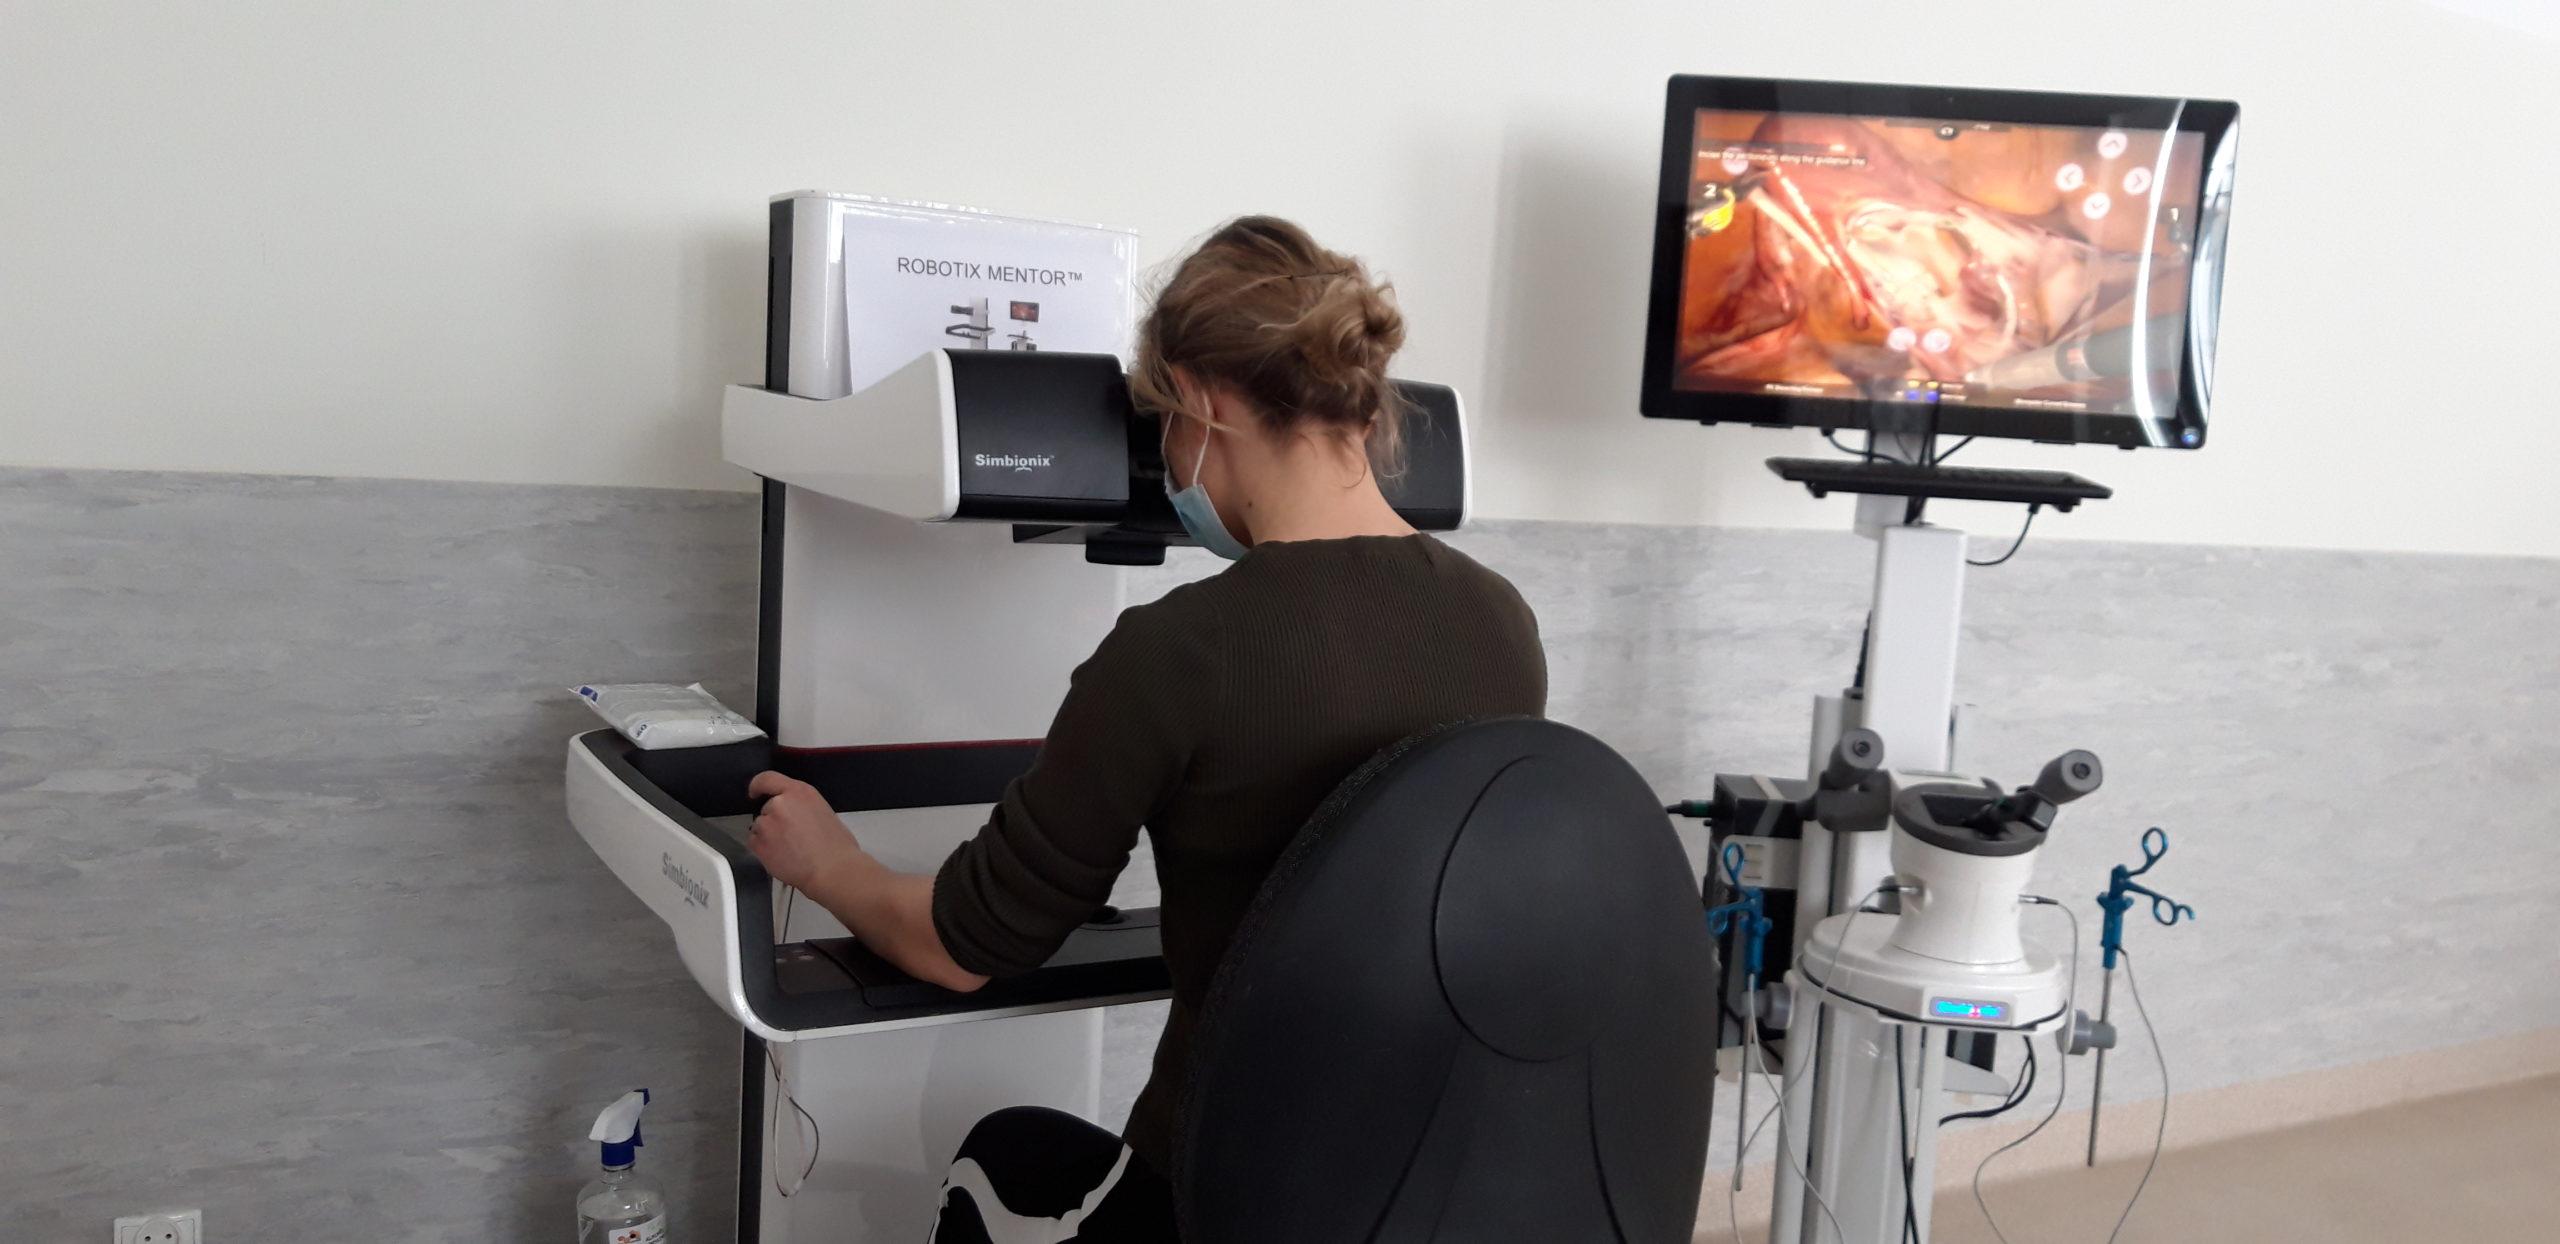 symulator laparoskopowy